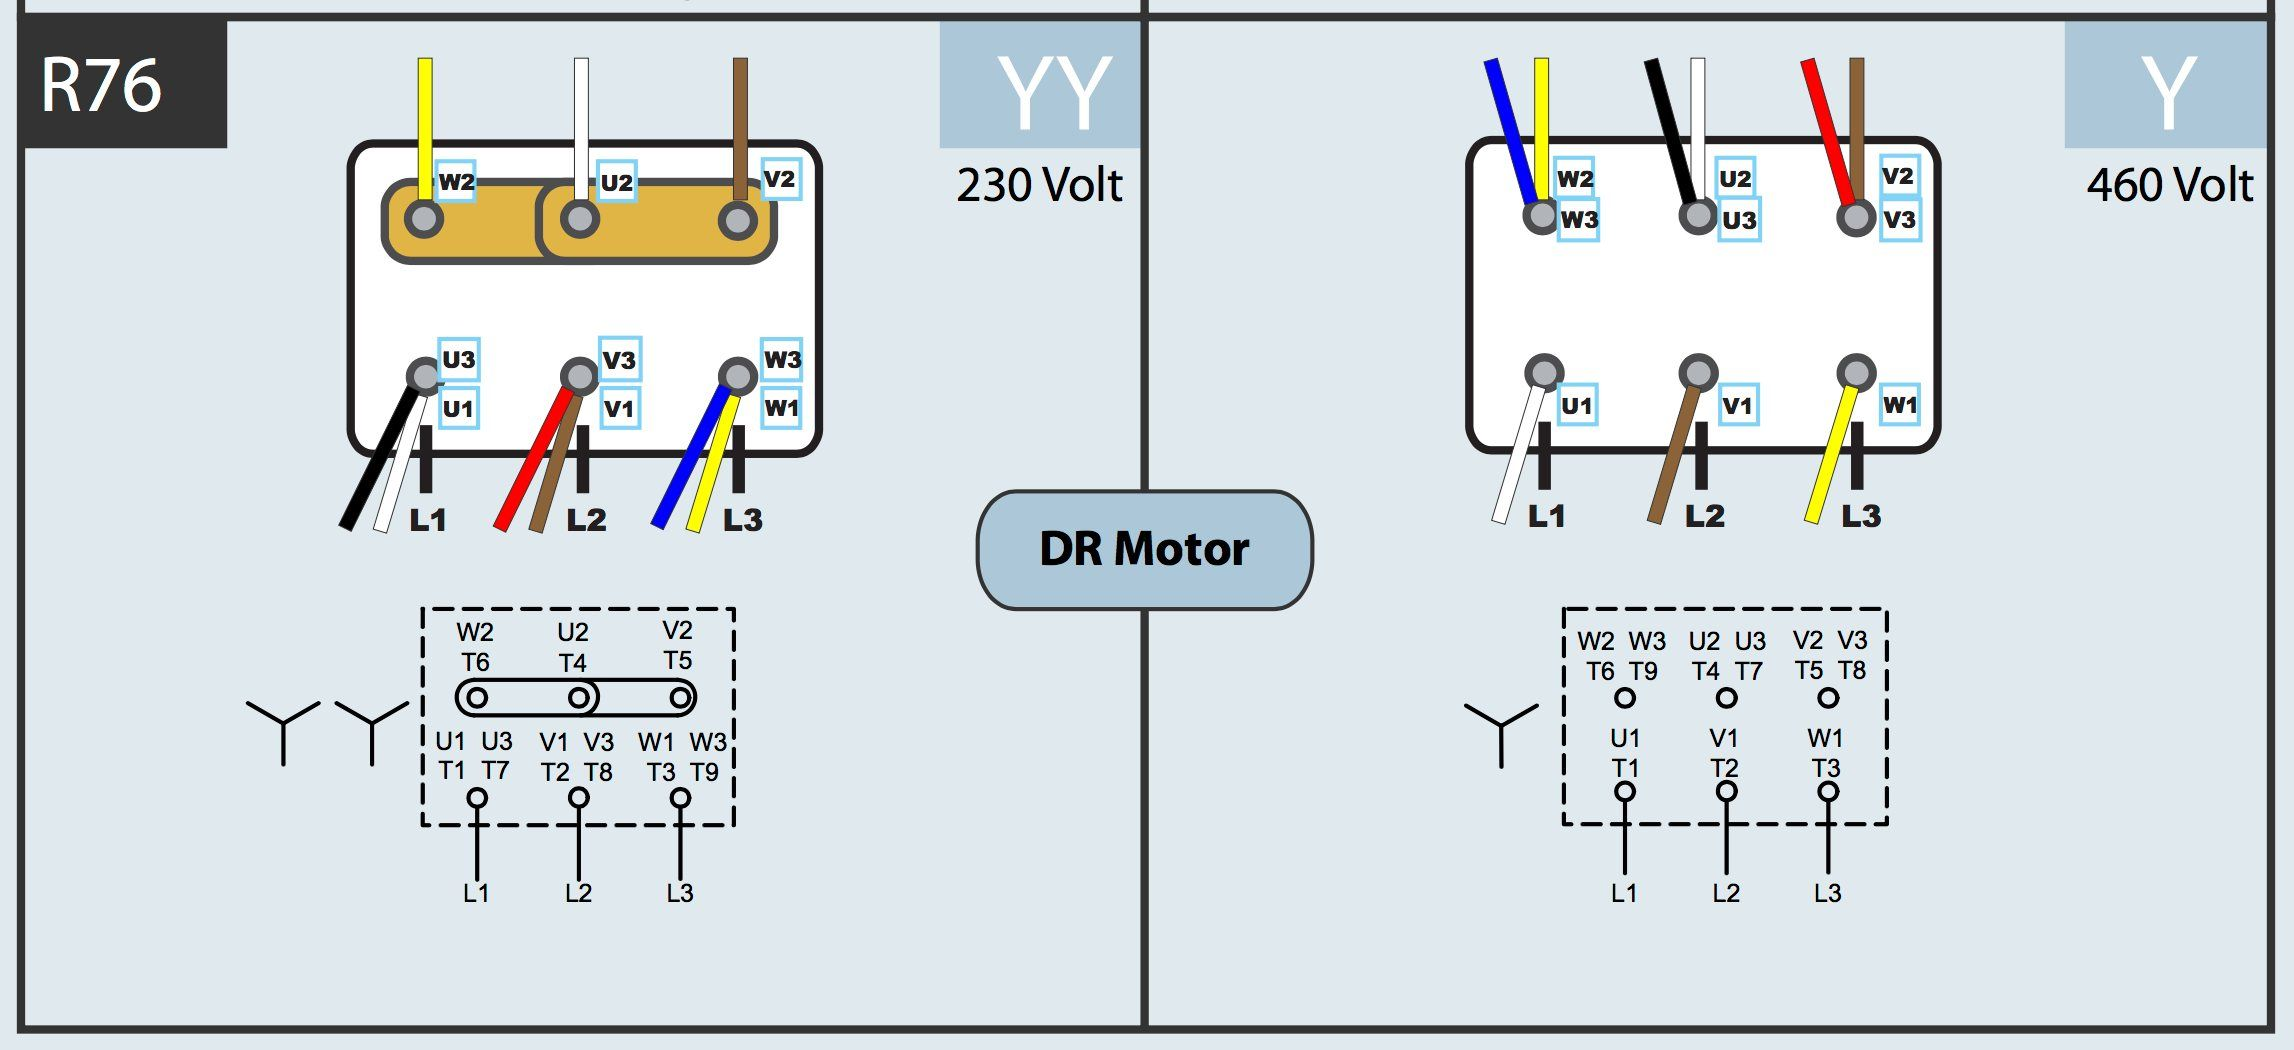 r76 jpg 2294 1050 wireing pinterest rh pinterest com Baldor Electric Motor Wiring Diagrams Emerson Compressor Motor Wiring Diagram